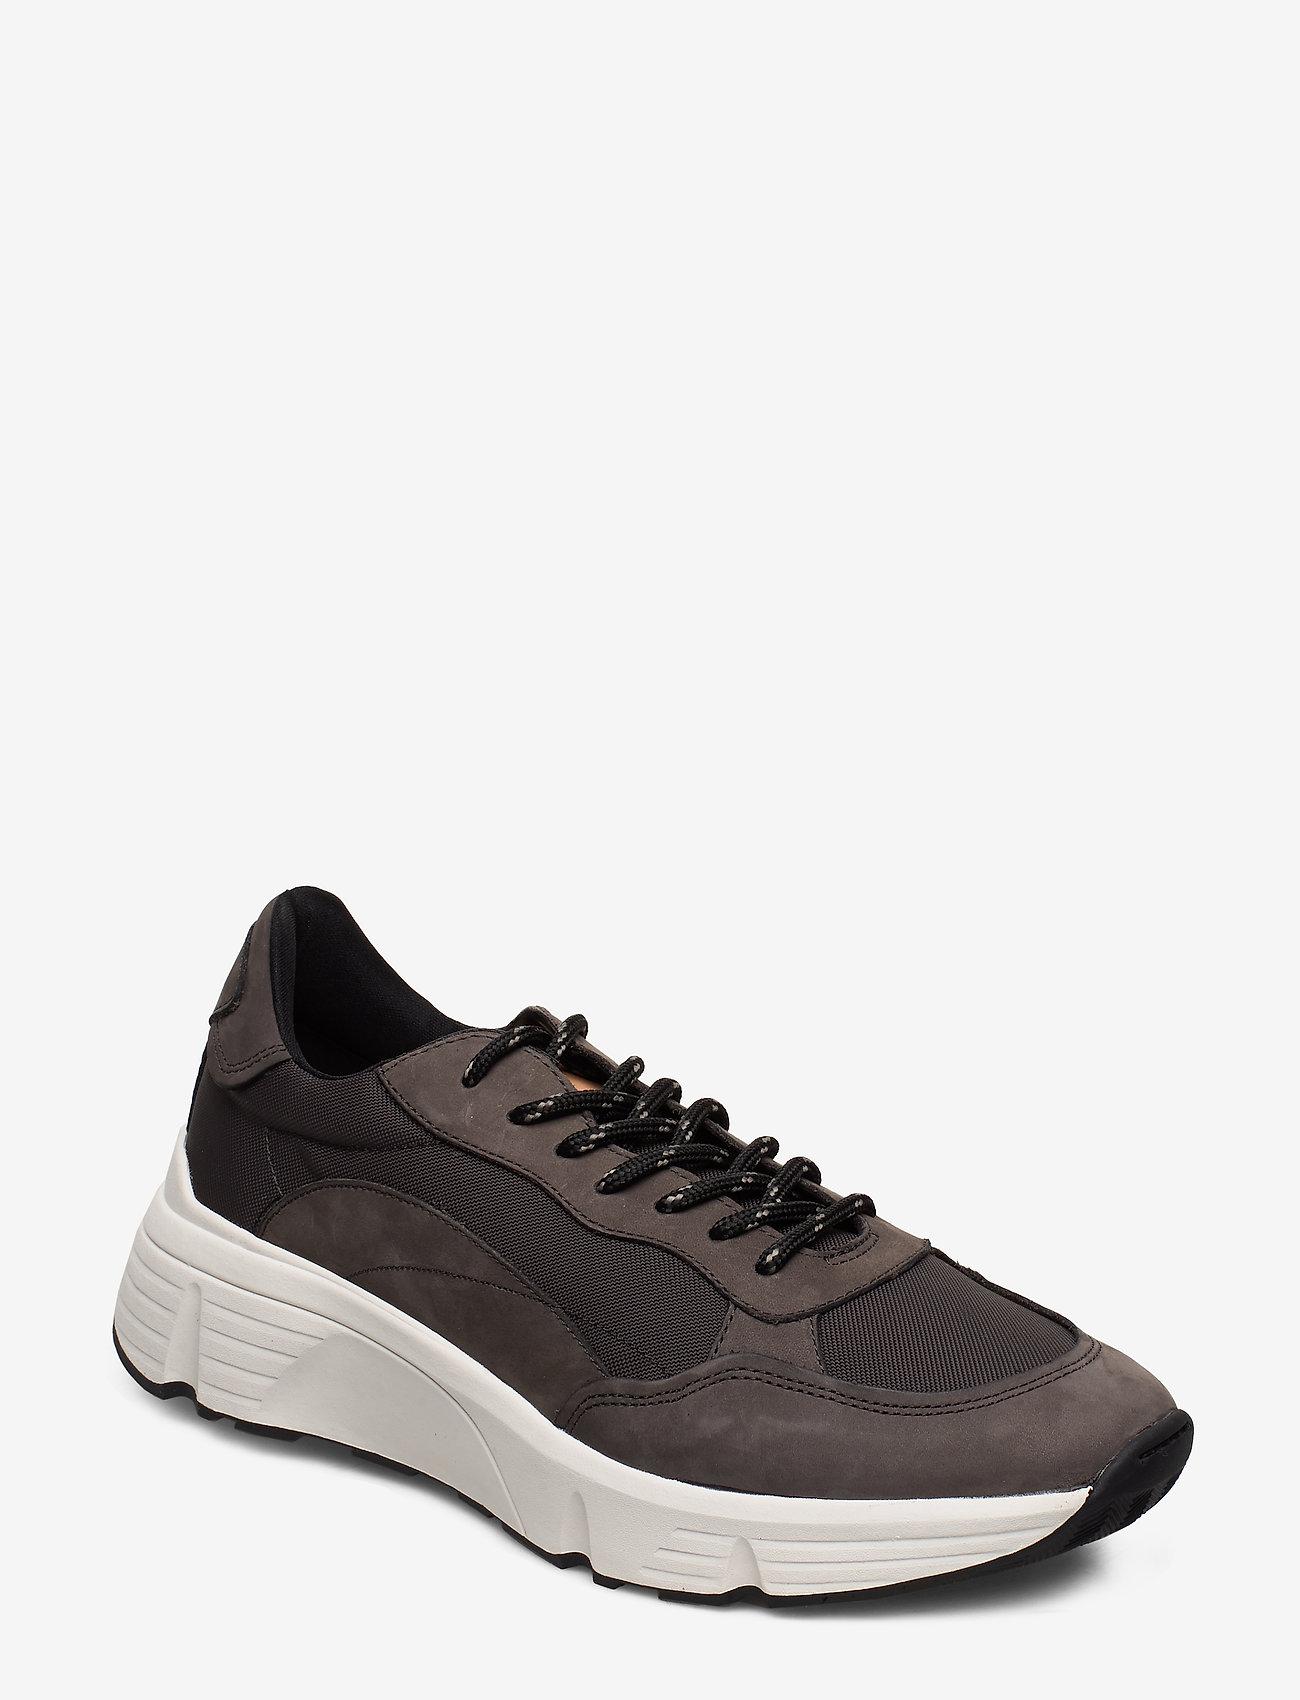 Vagabond Quincy - Sneakers Dk Grey